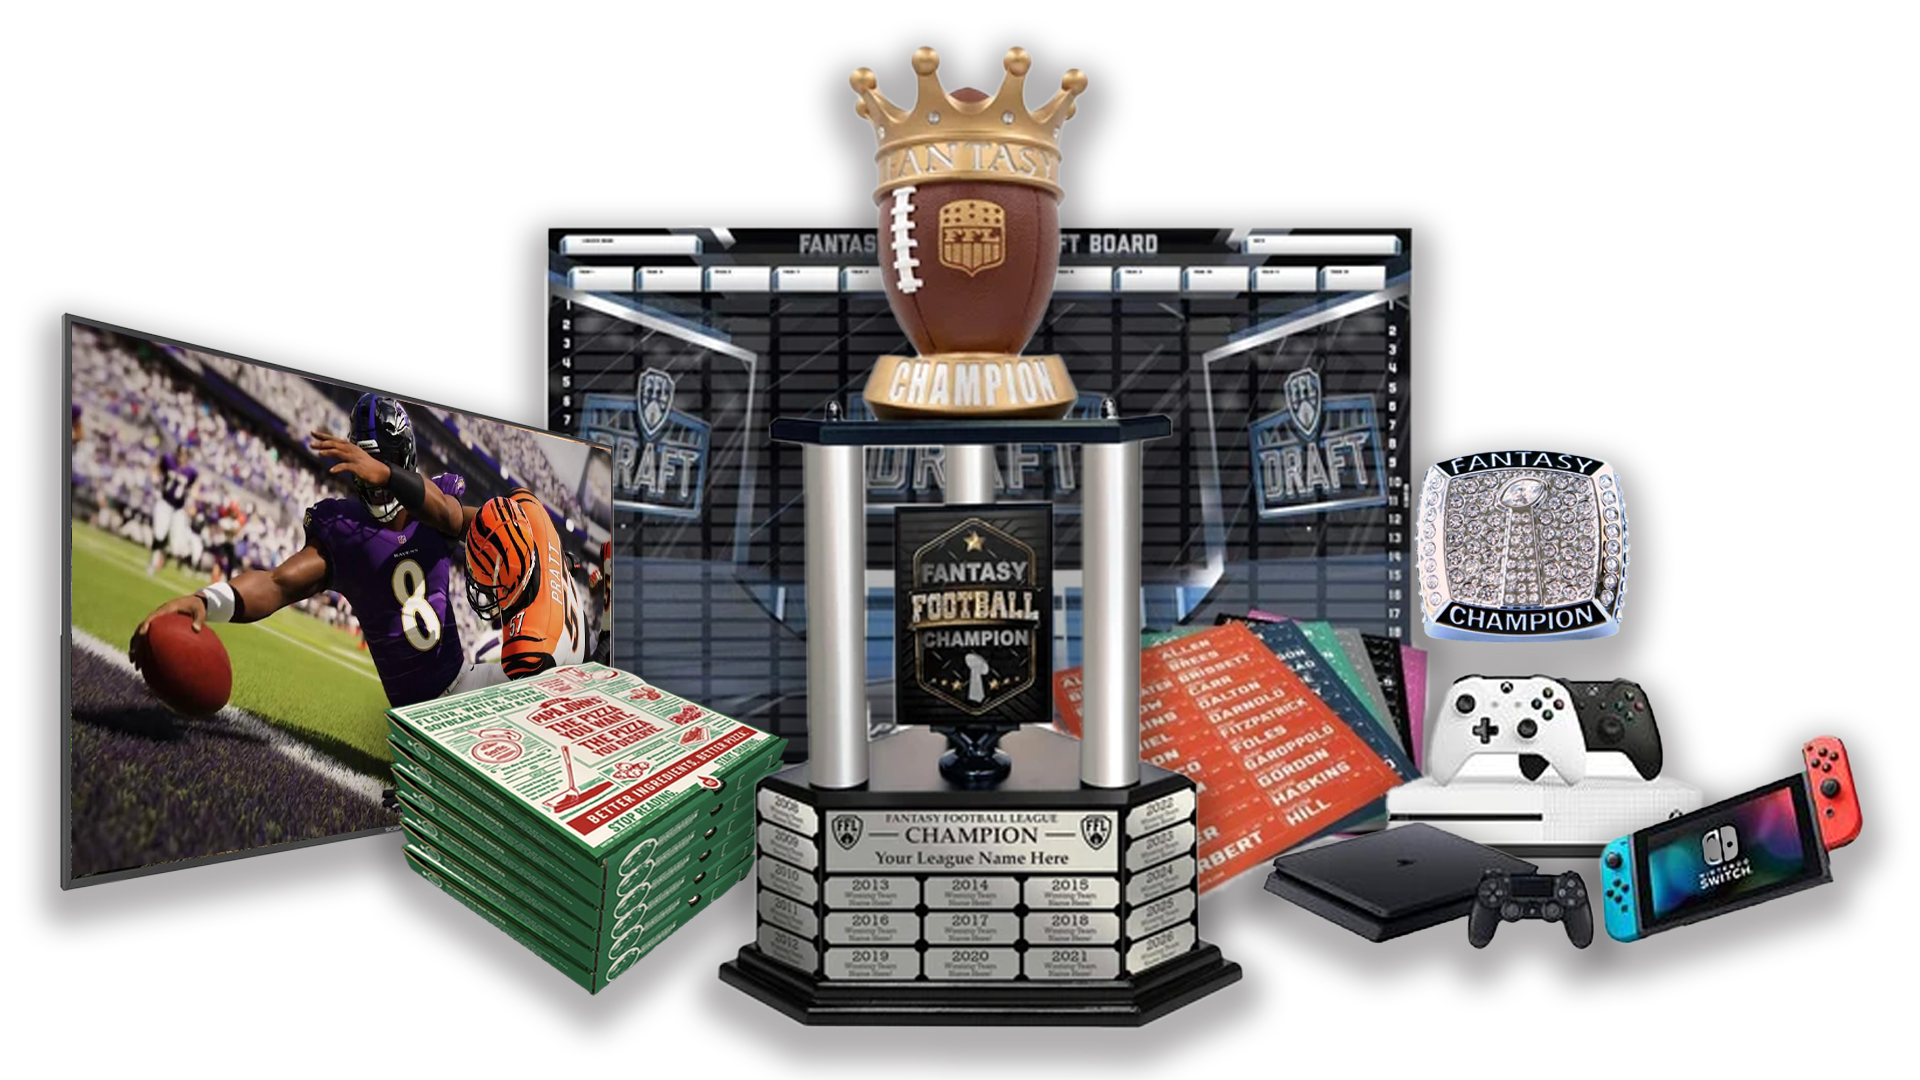 - FFDraft Trophy 2 Pizza - Fantasy Football Draft Parties at 1Life2Play